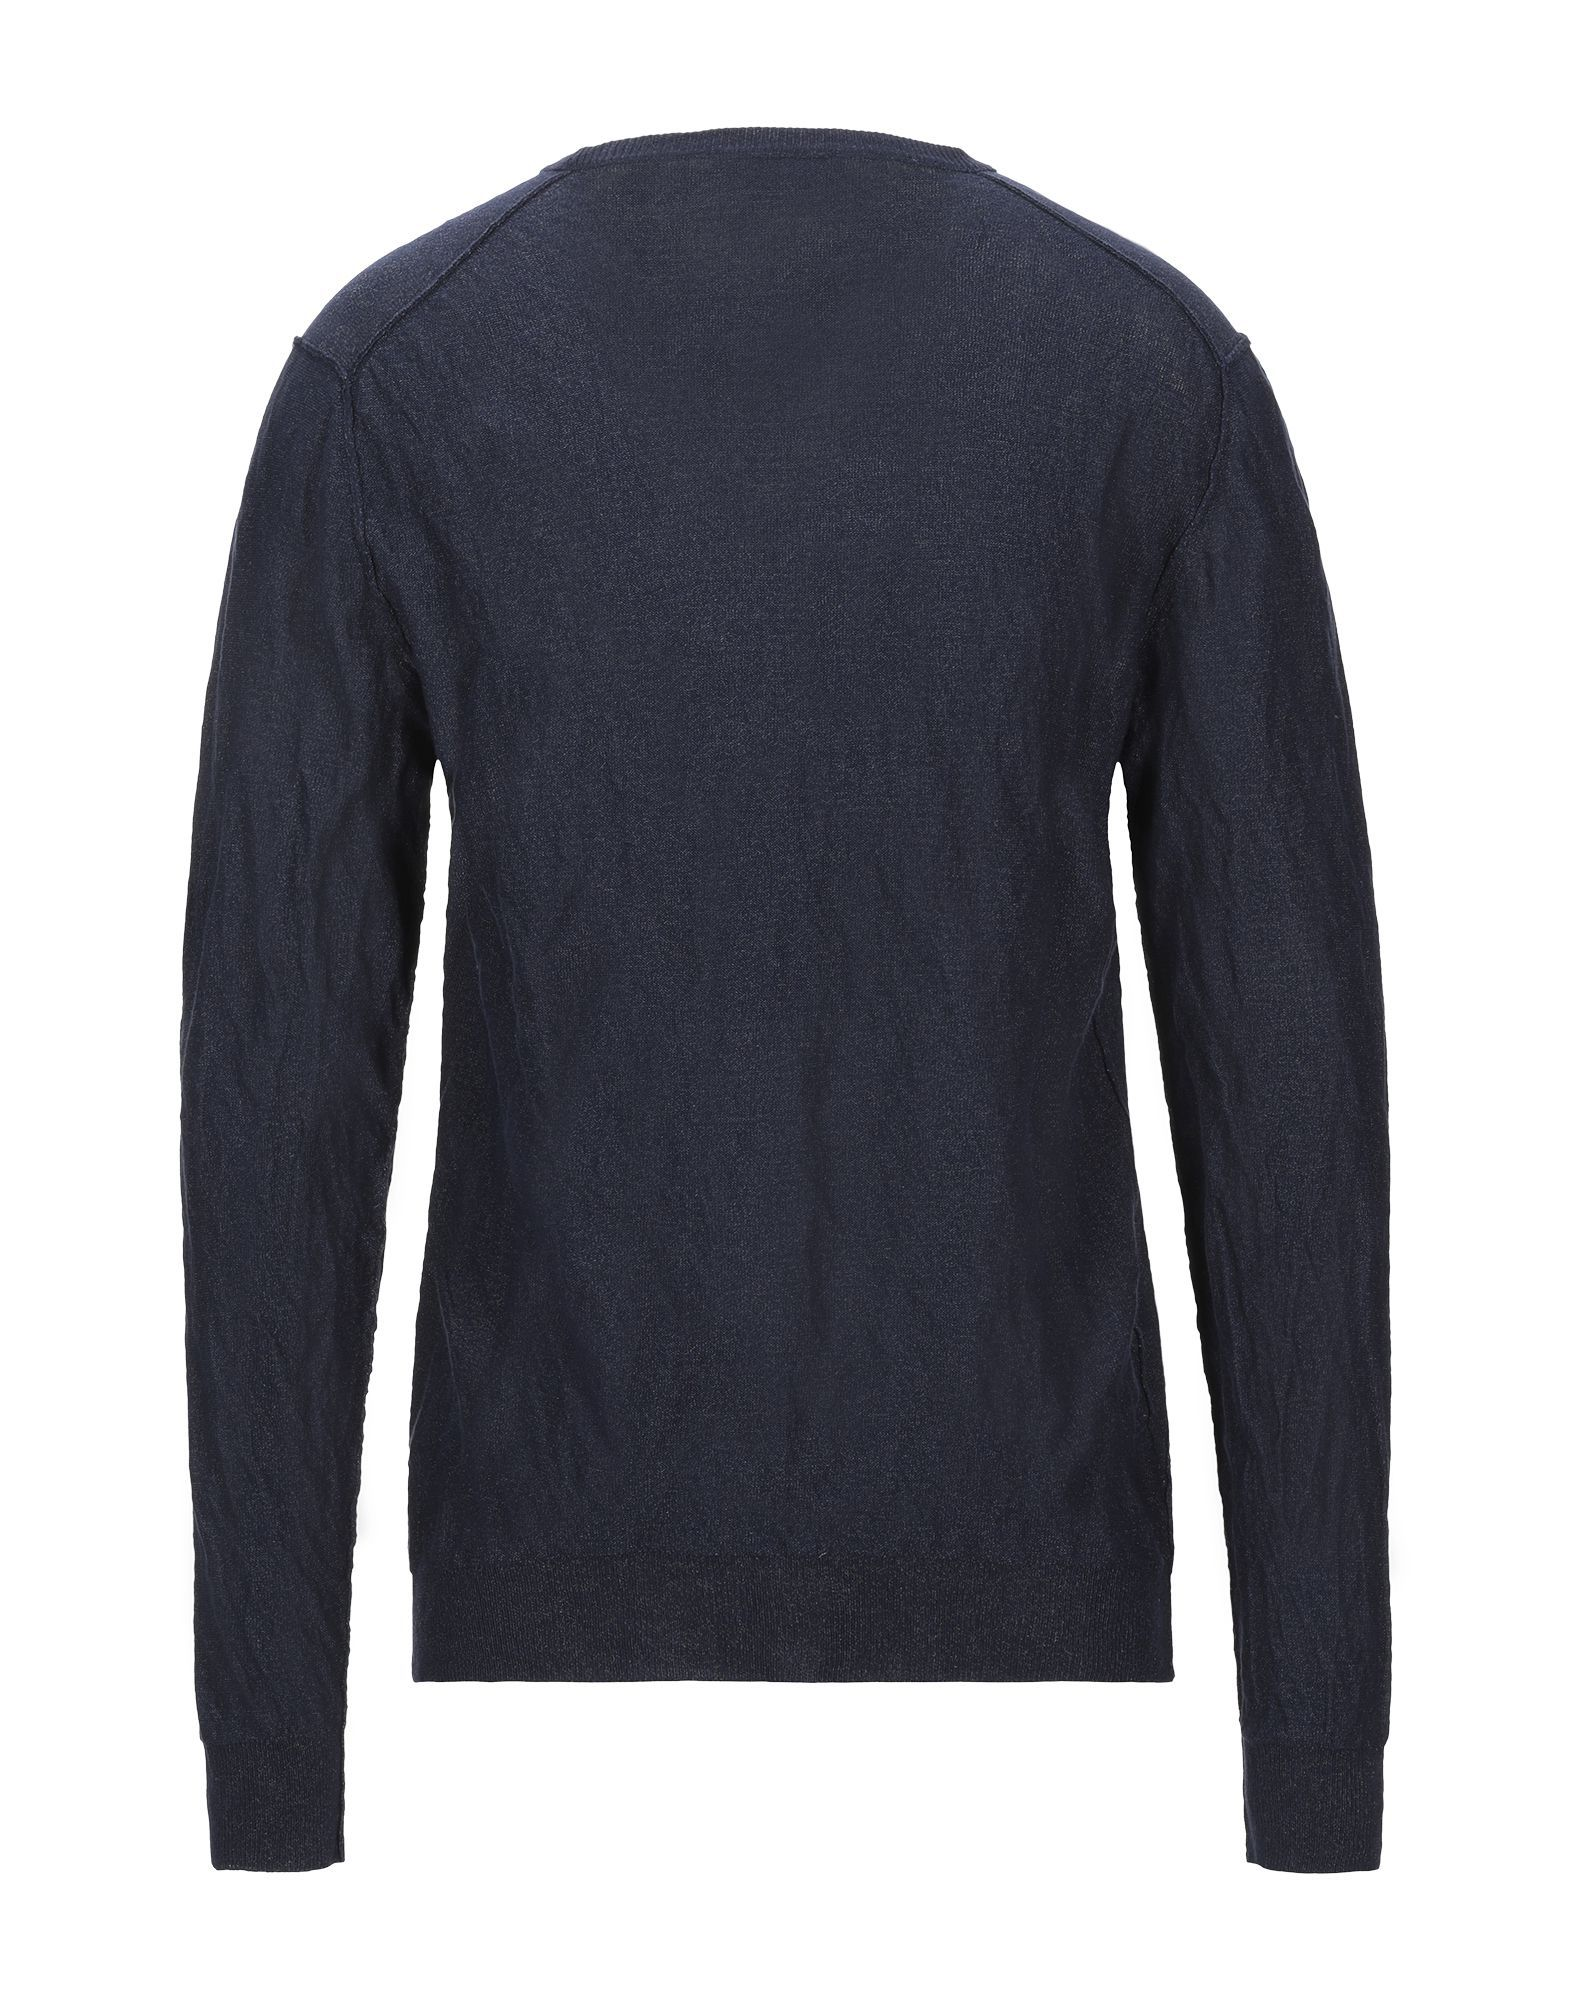 KNITWEAR Man Aglini Dark blue Cotton